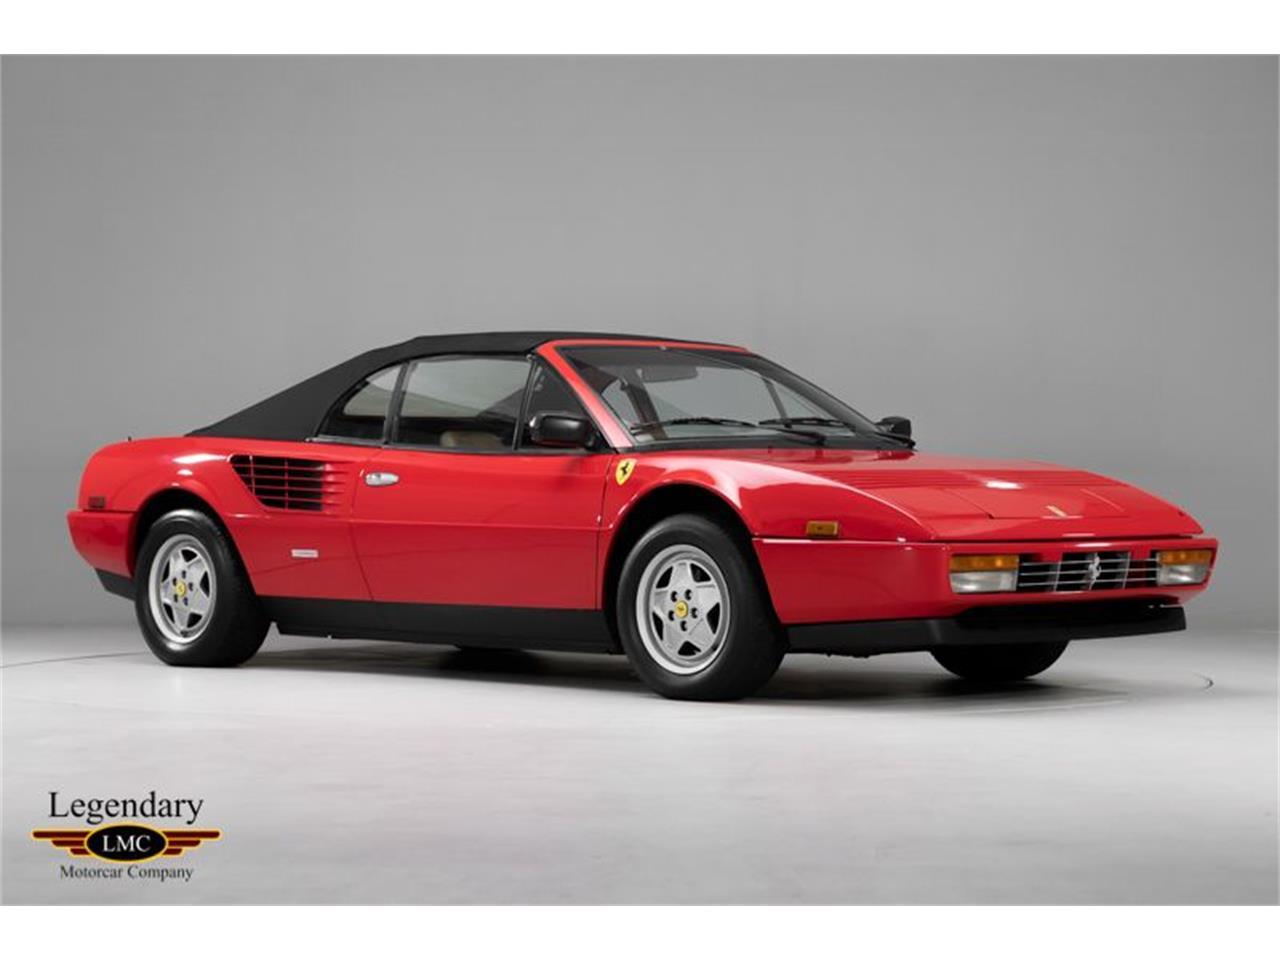 1986 ferrari mondial for sale | classiccars | cc-1185221